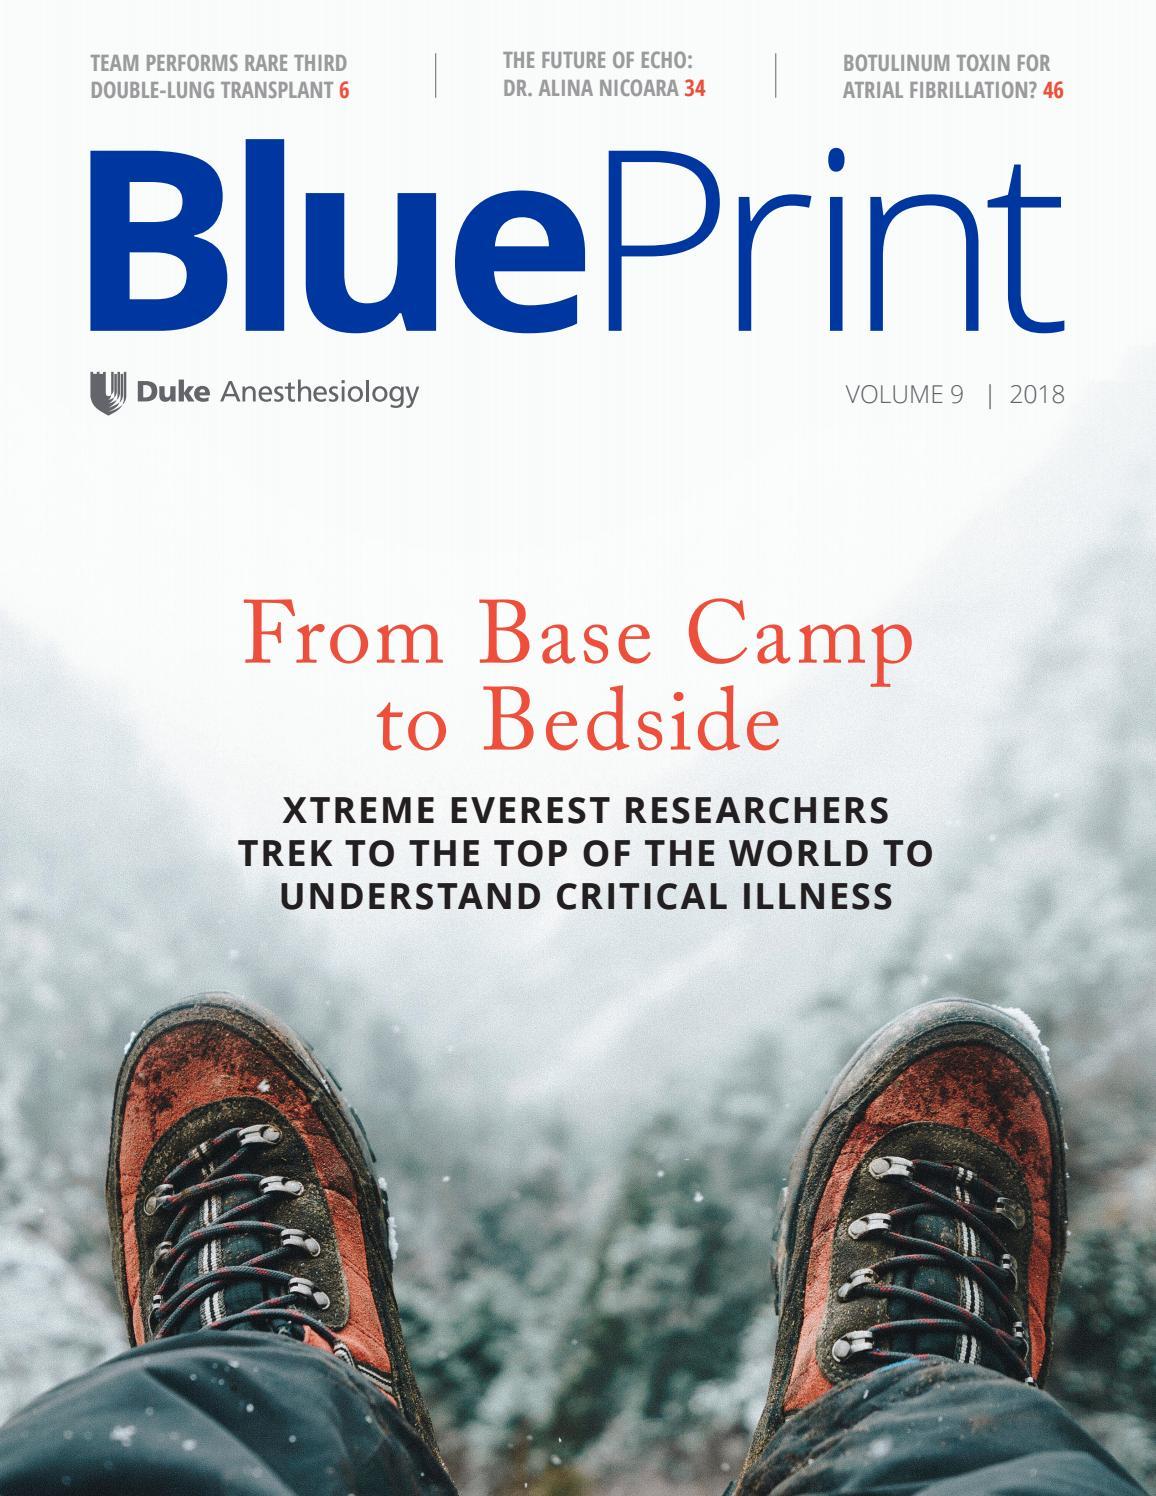 BluePrint 2018 by Duke Anesthesiology - issuu